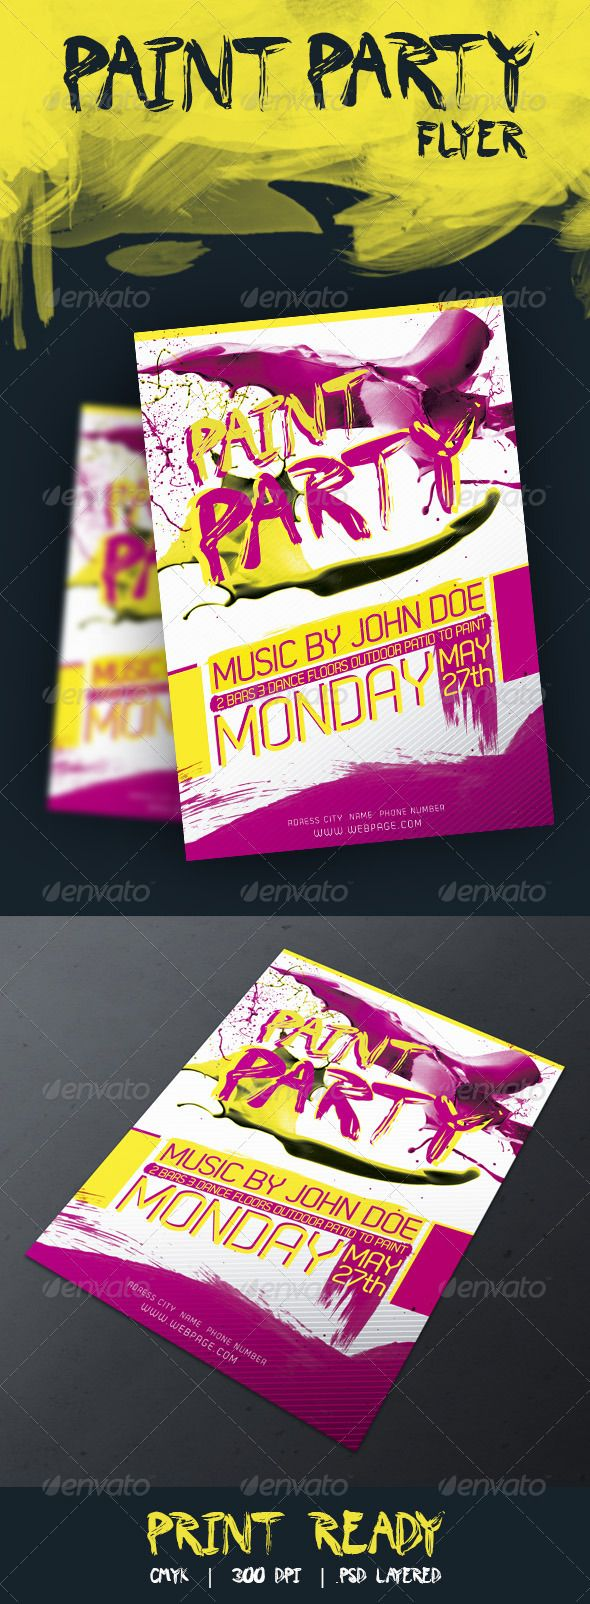 Poster design template free - Paint Party Flyer Psd Templatesflyer Templatedesign